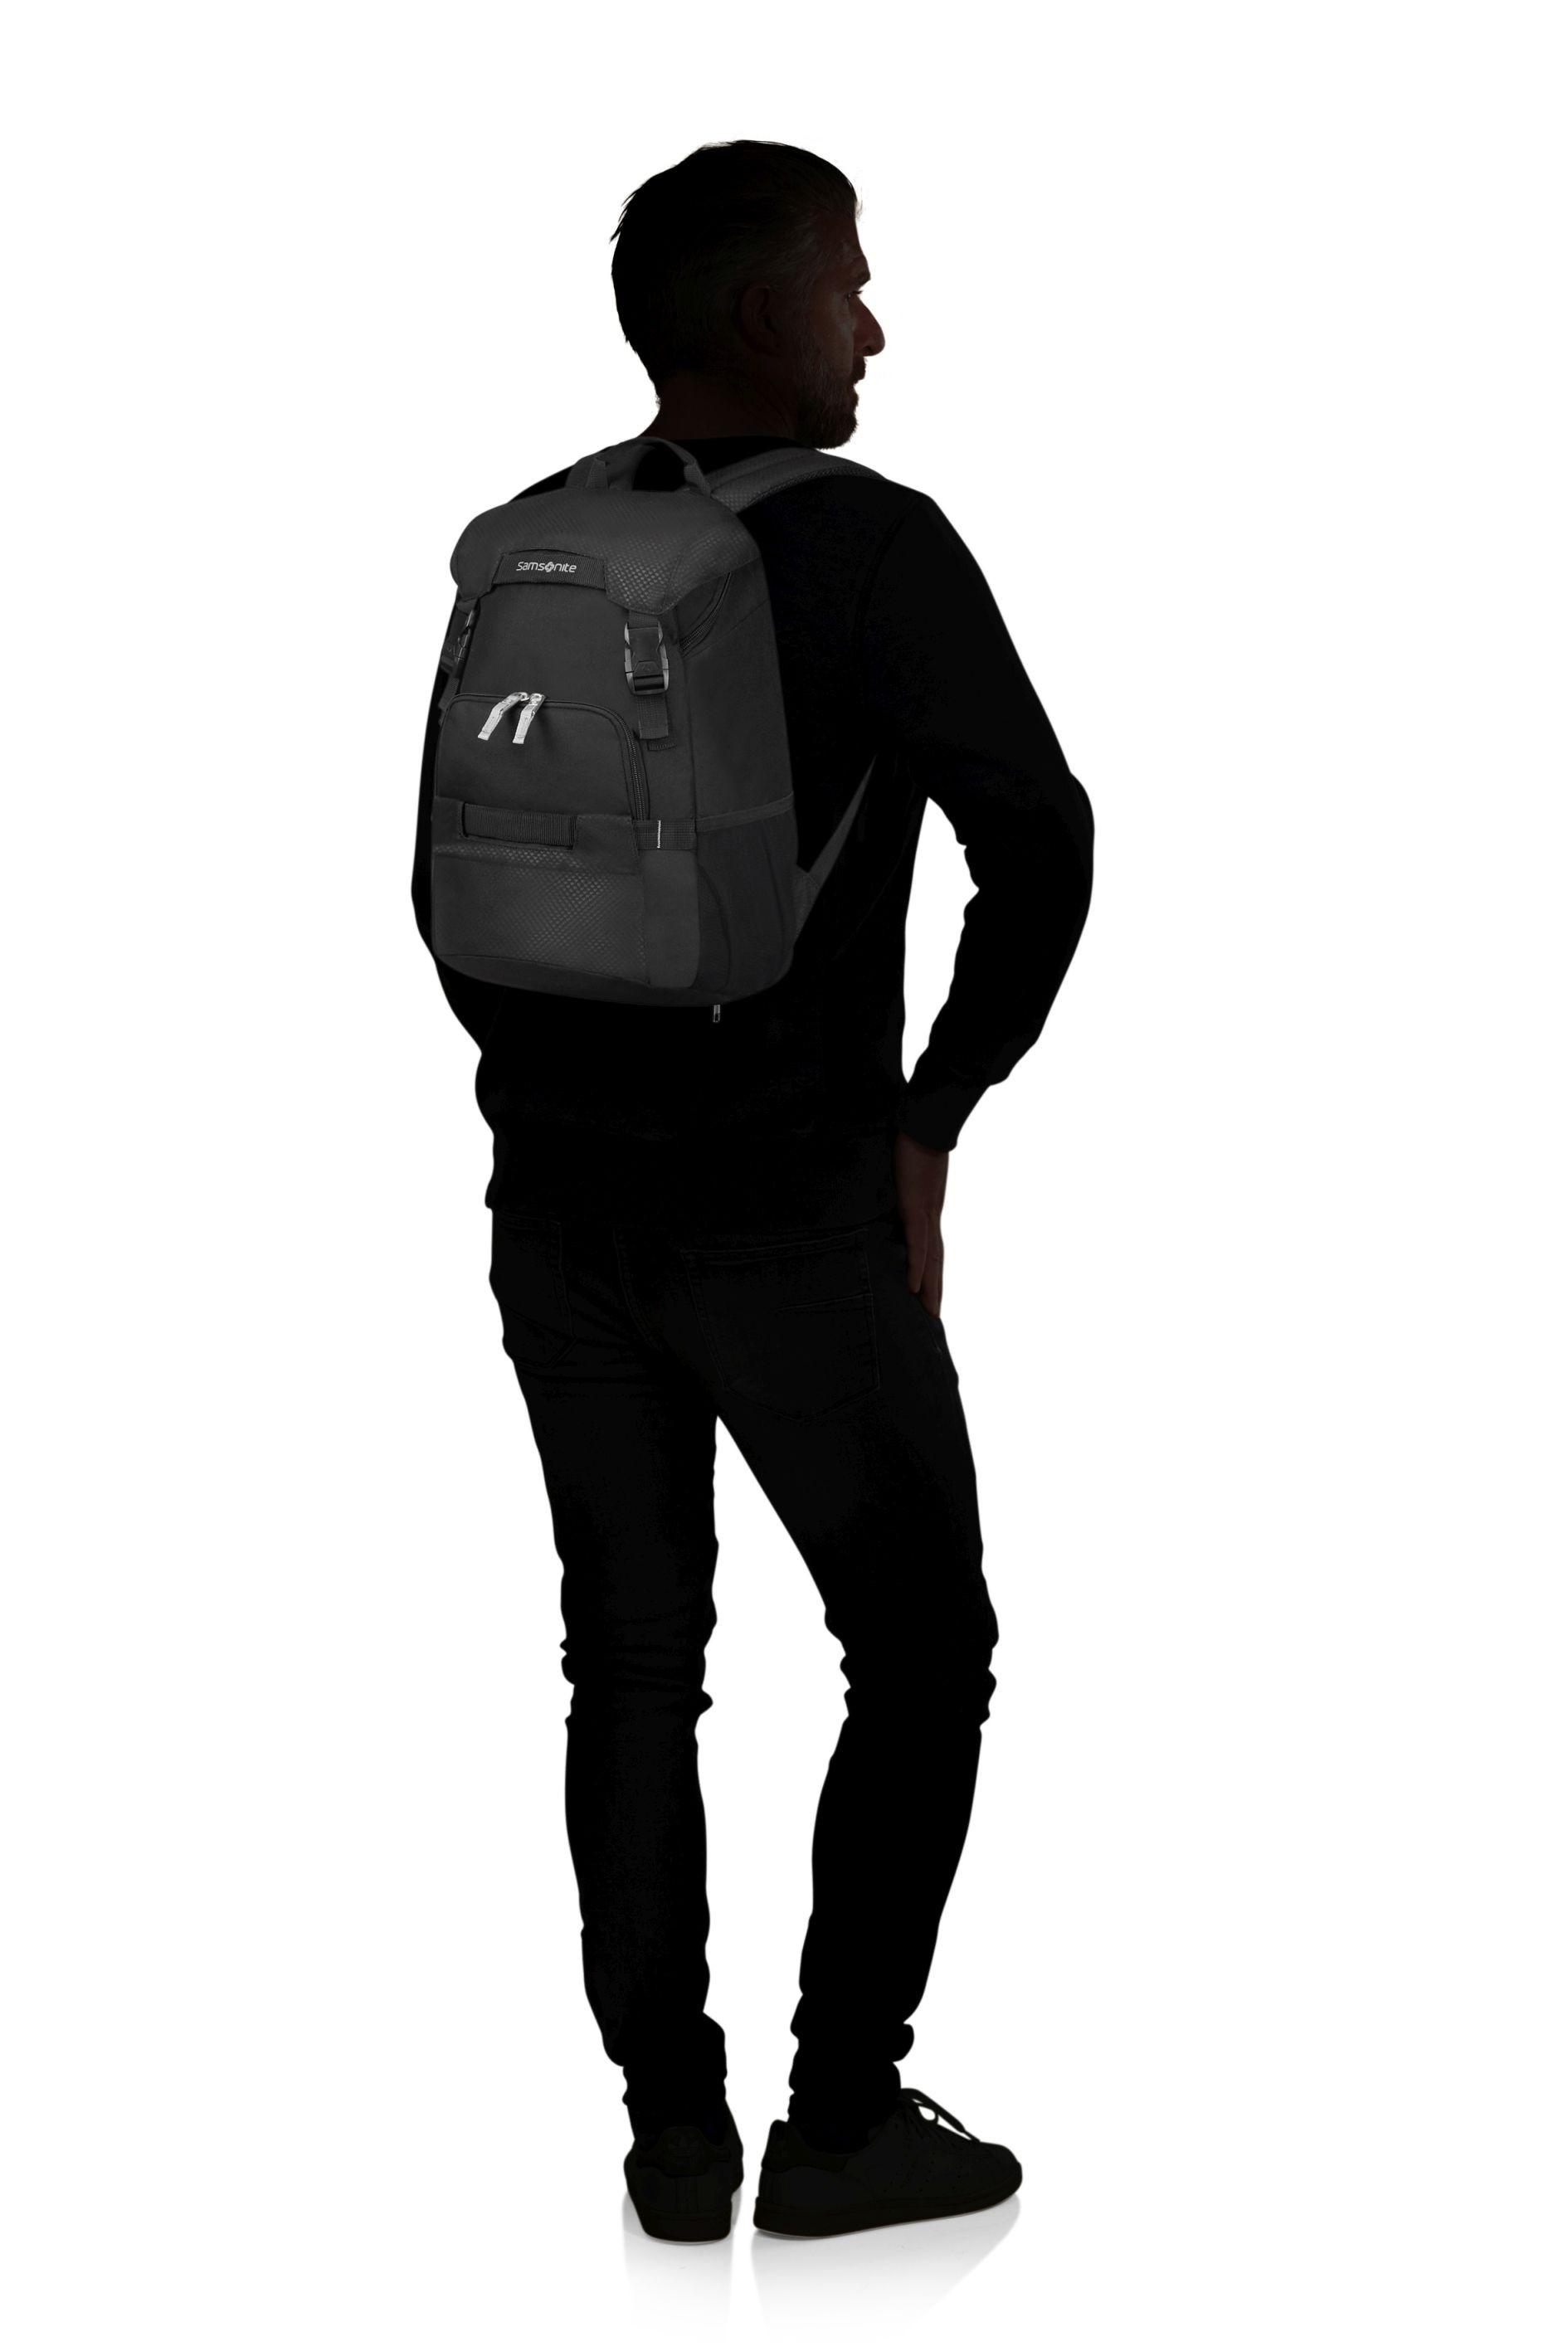 Samsonite Sonora Laptop Backpack M, View 9